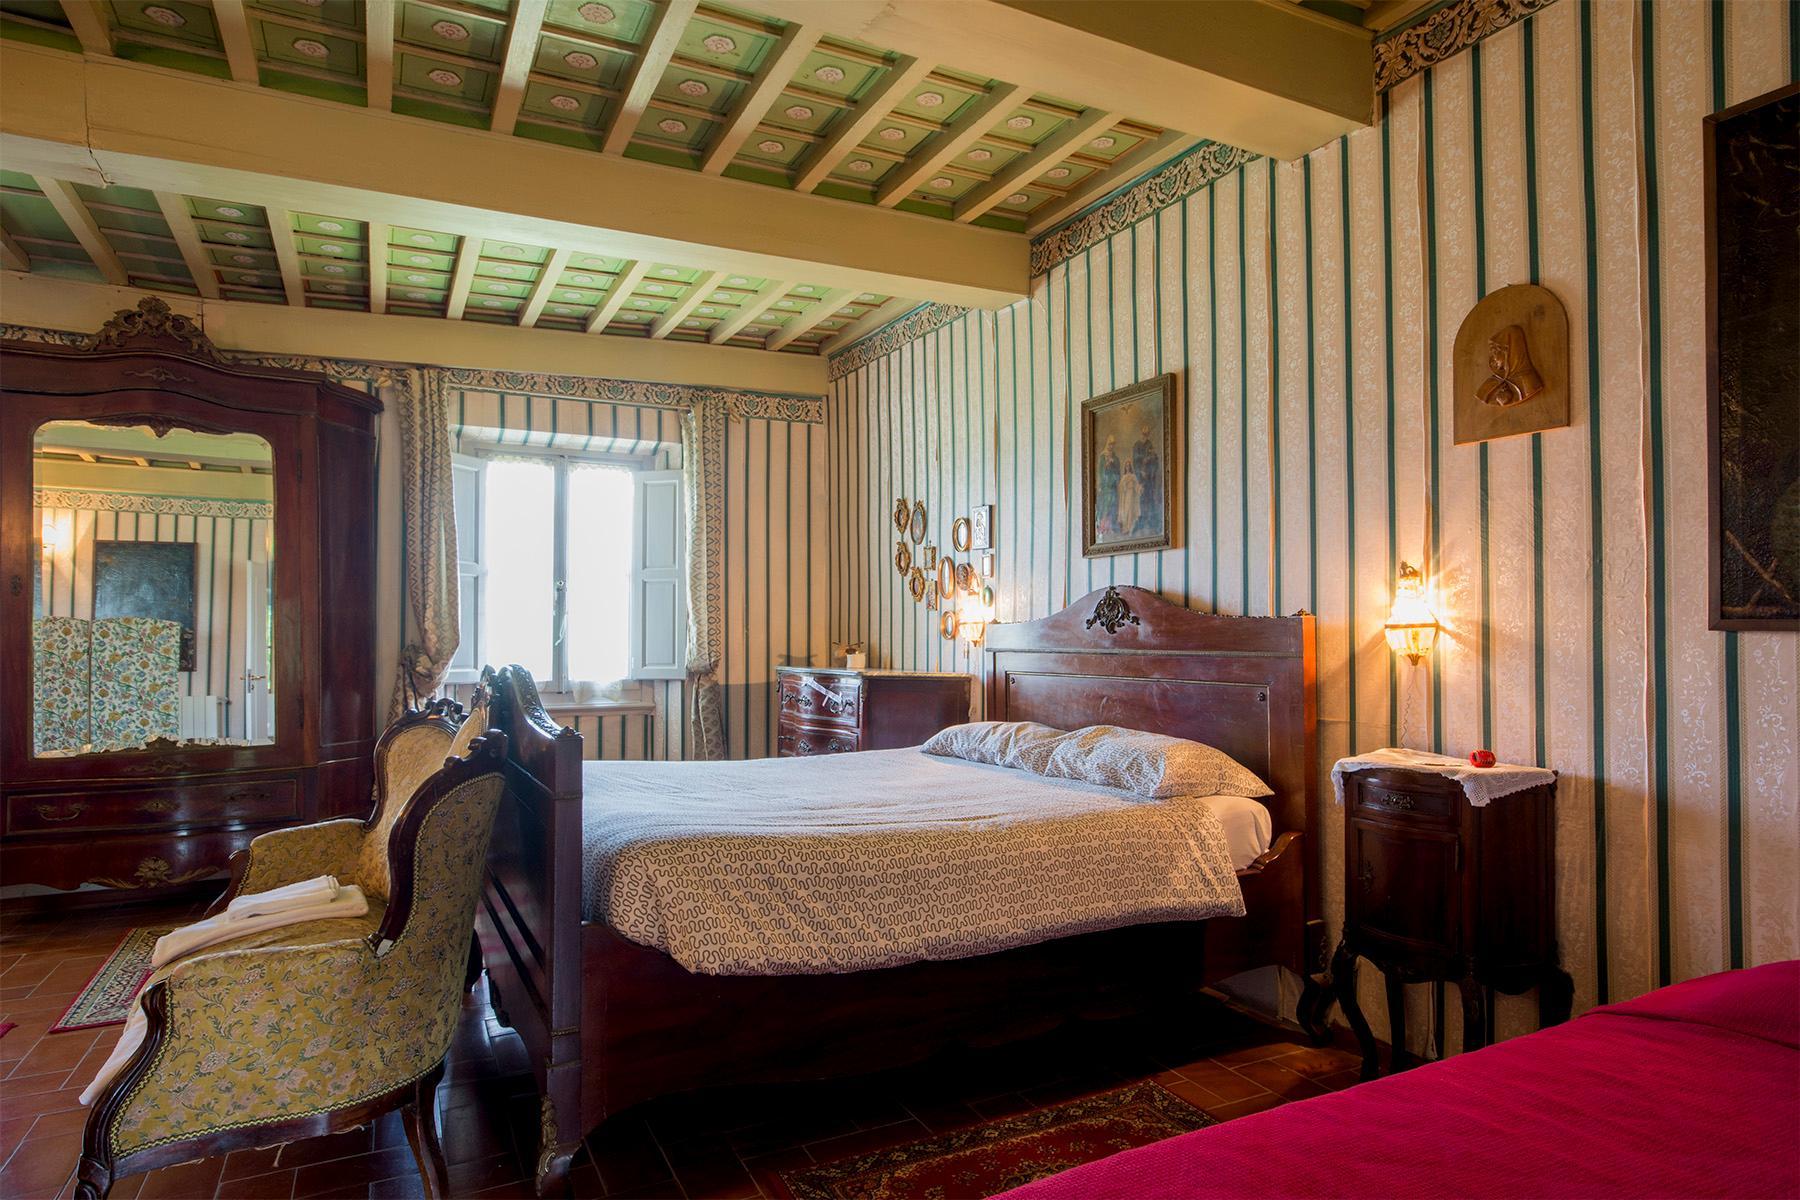 Villa charmante dans dans la Val di Sieve - 13